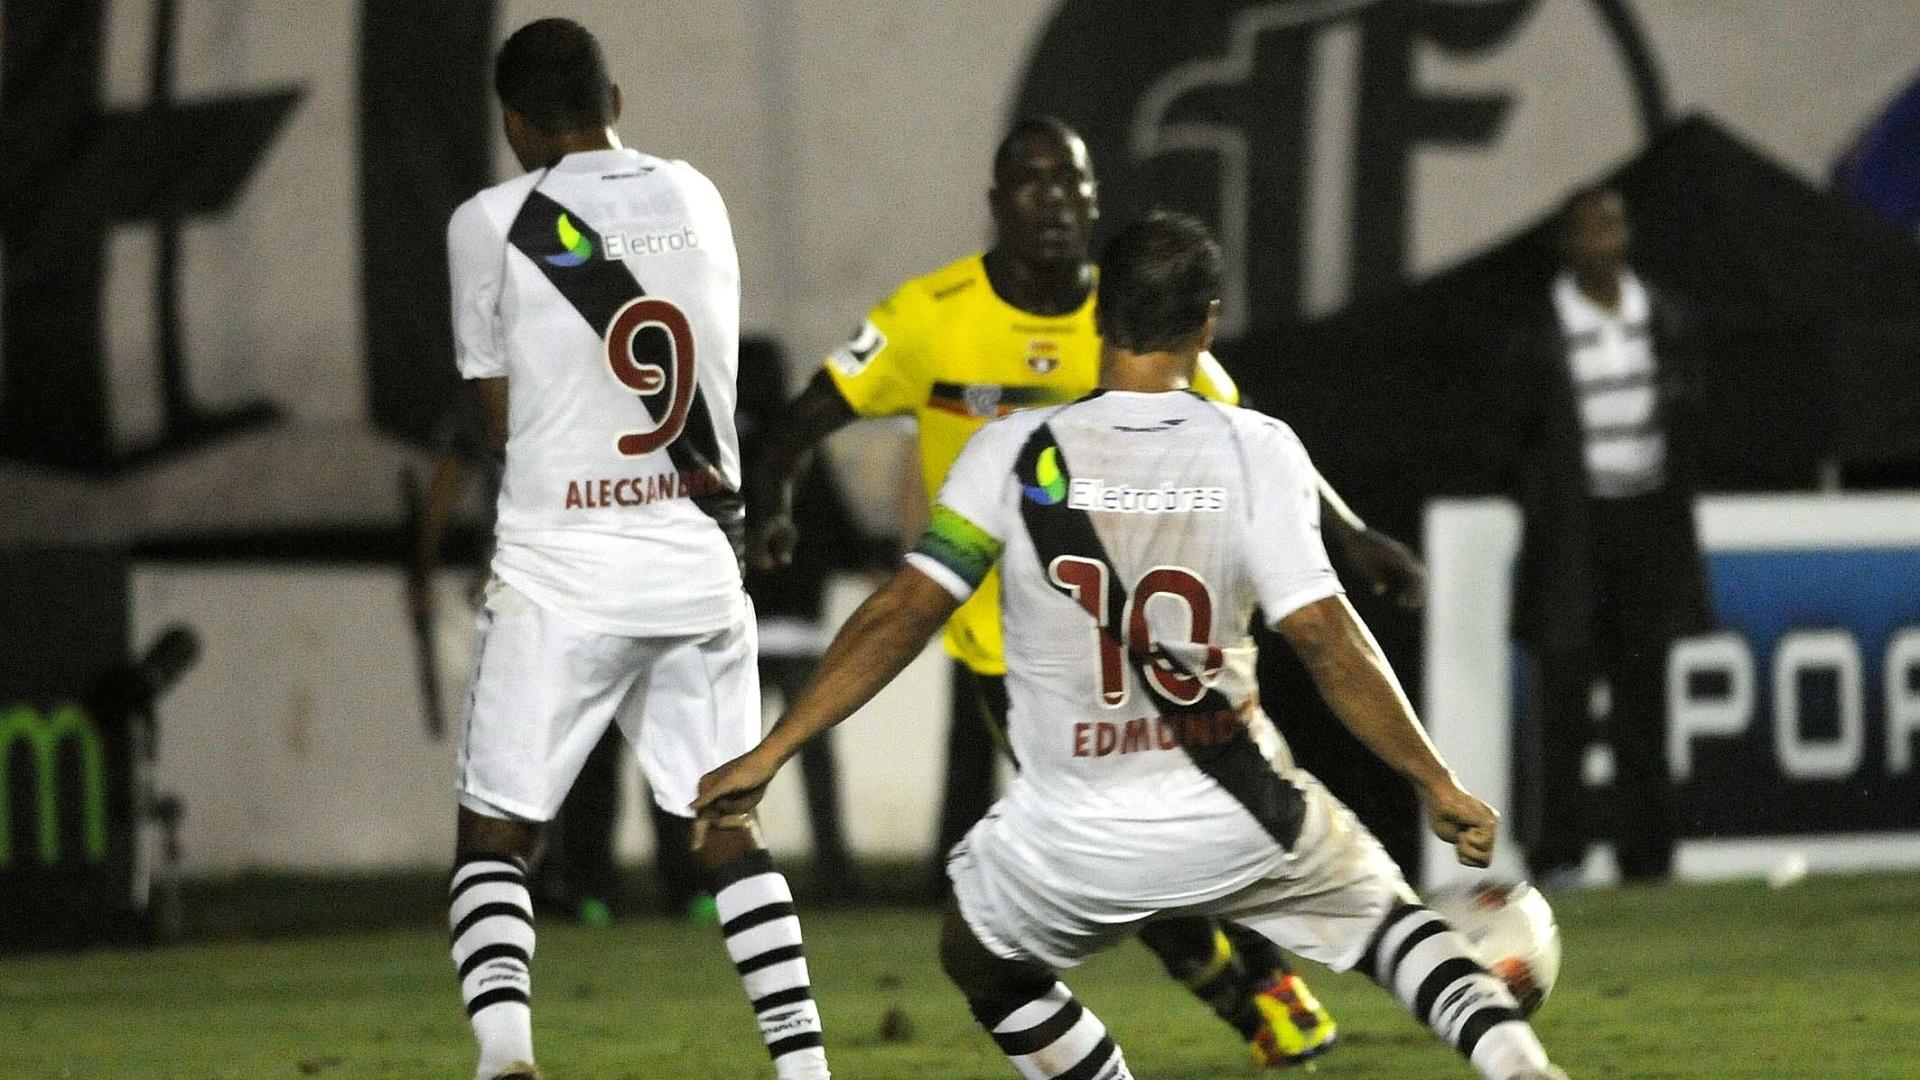 Edmundo chuta para marcar seu segundo gol na goleada do Vasco sobre o Barcelona (EQU), na despedida do atacante